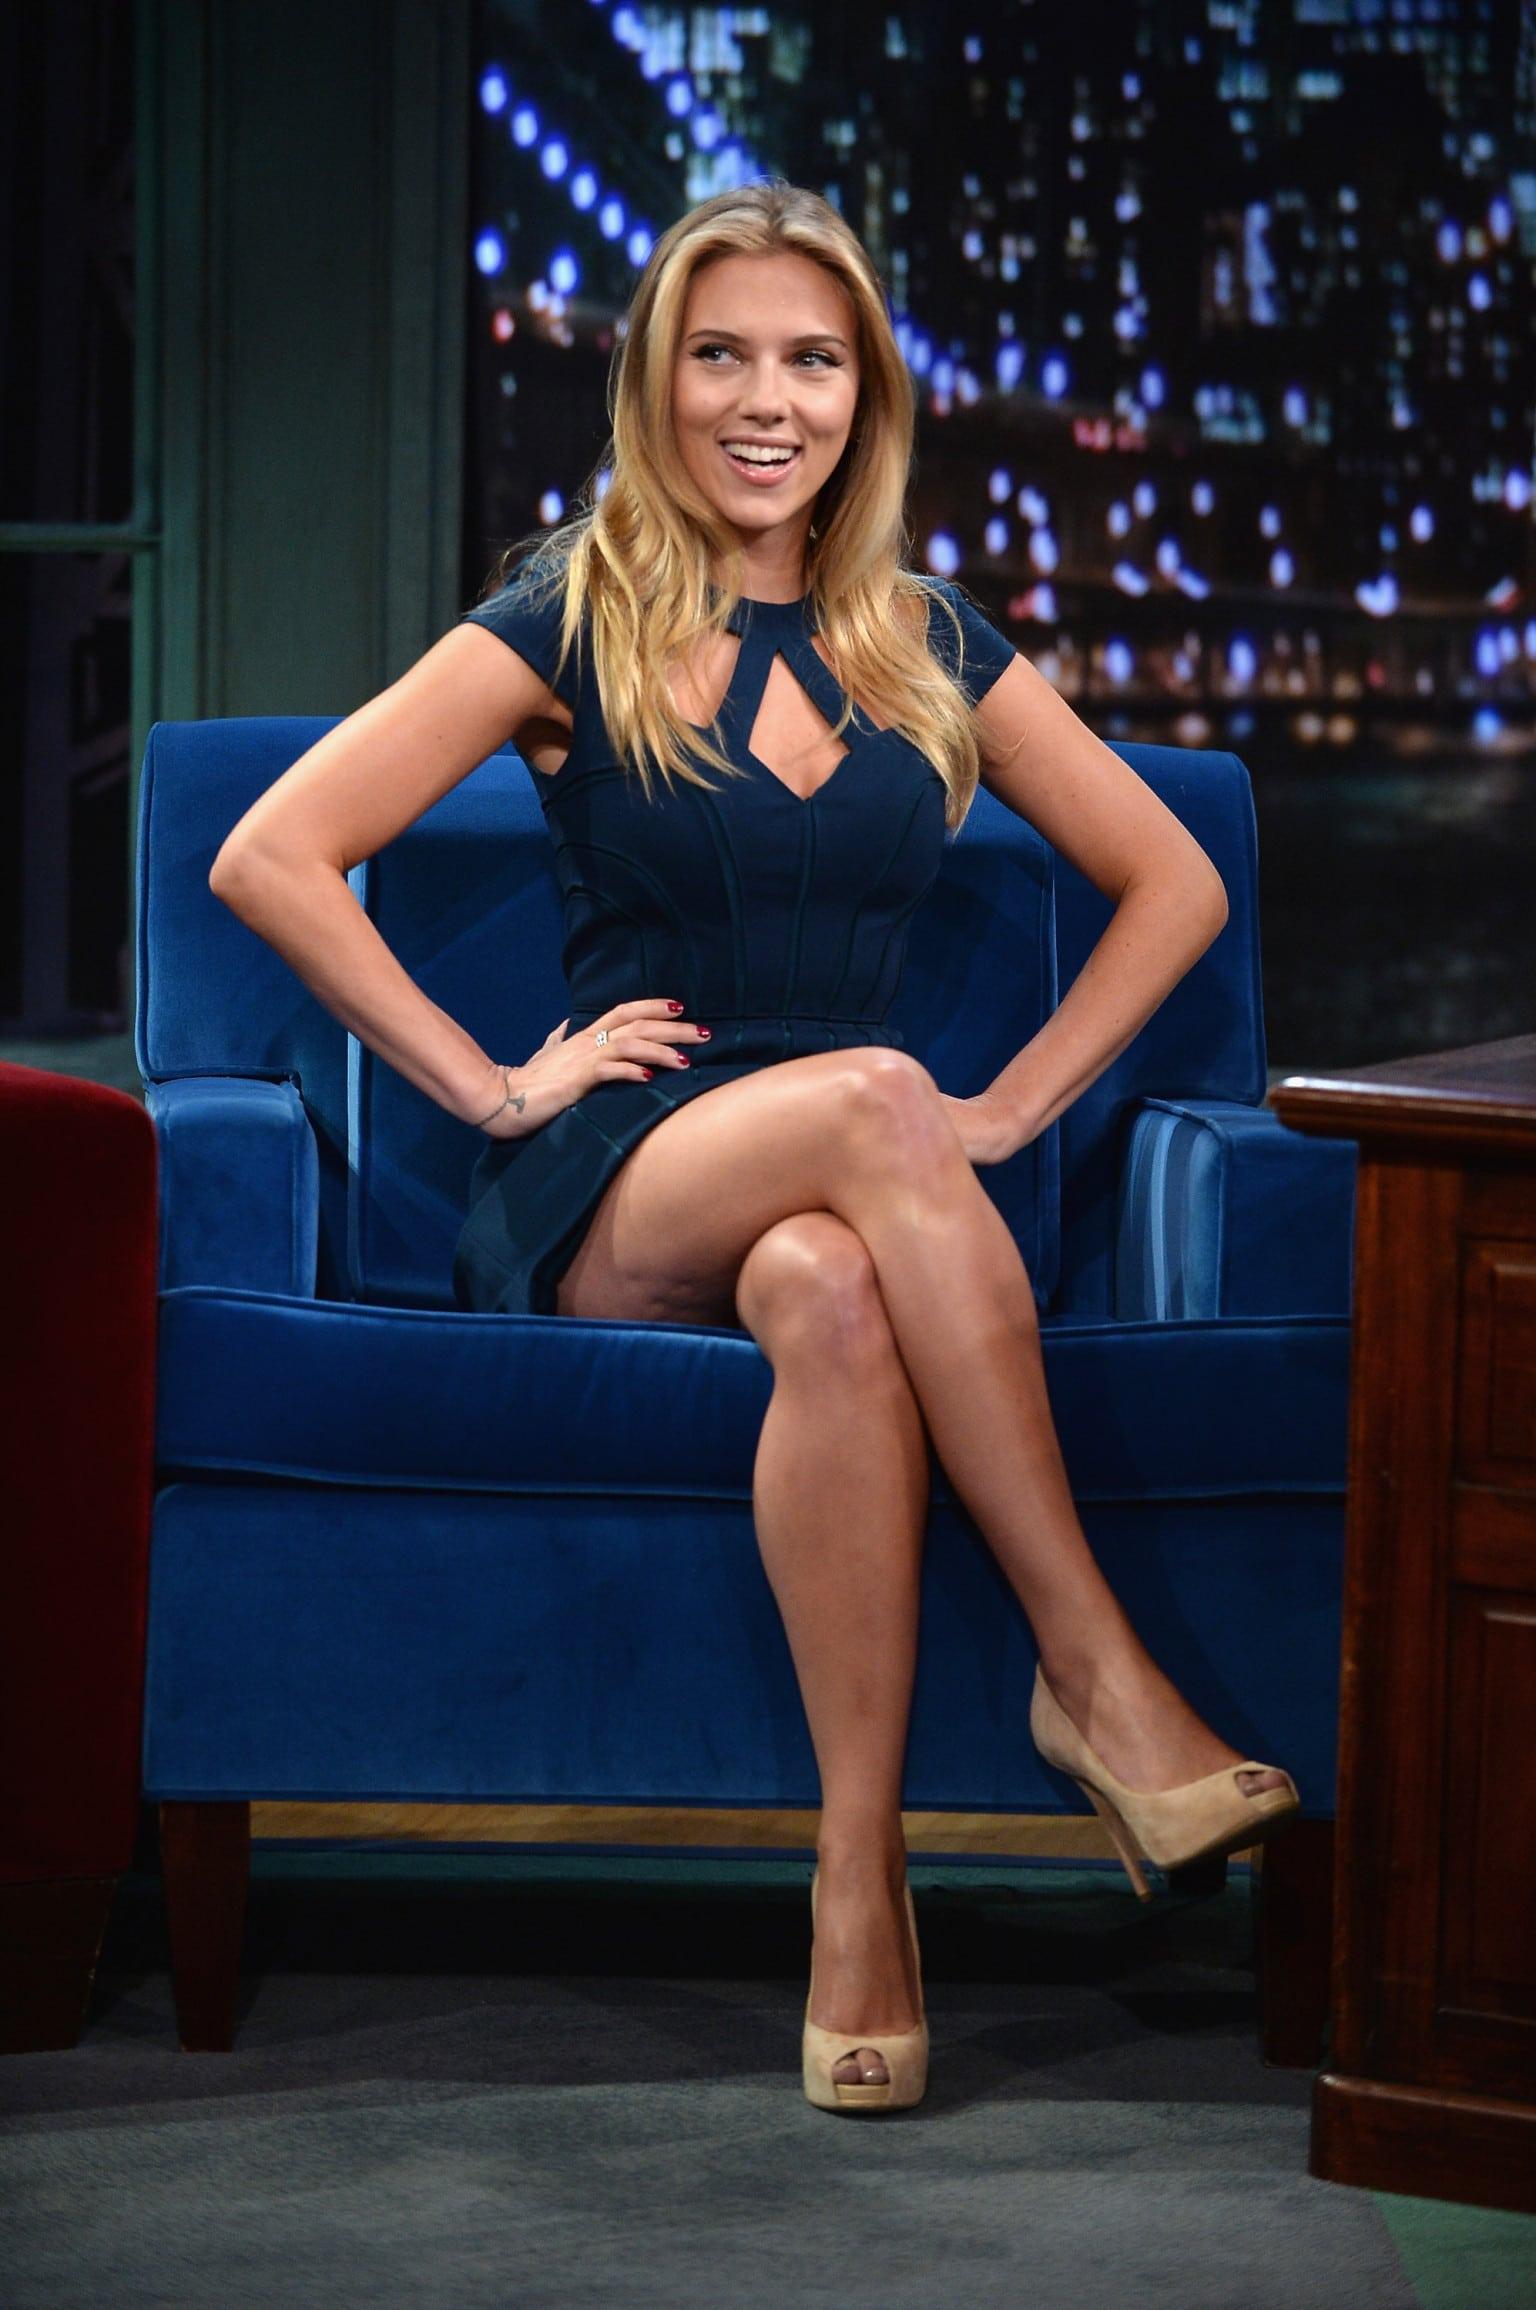 Scarlett Johansson sexy pics (3)